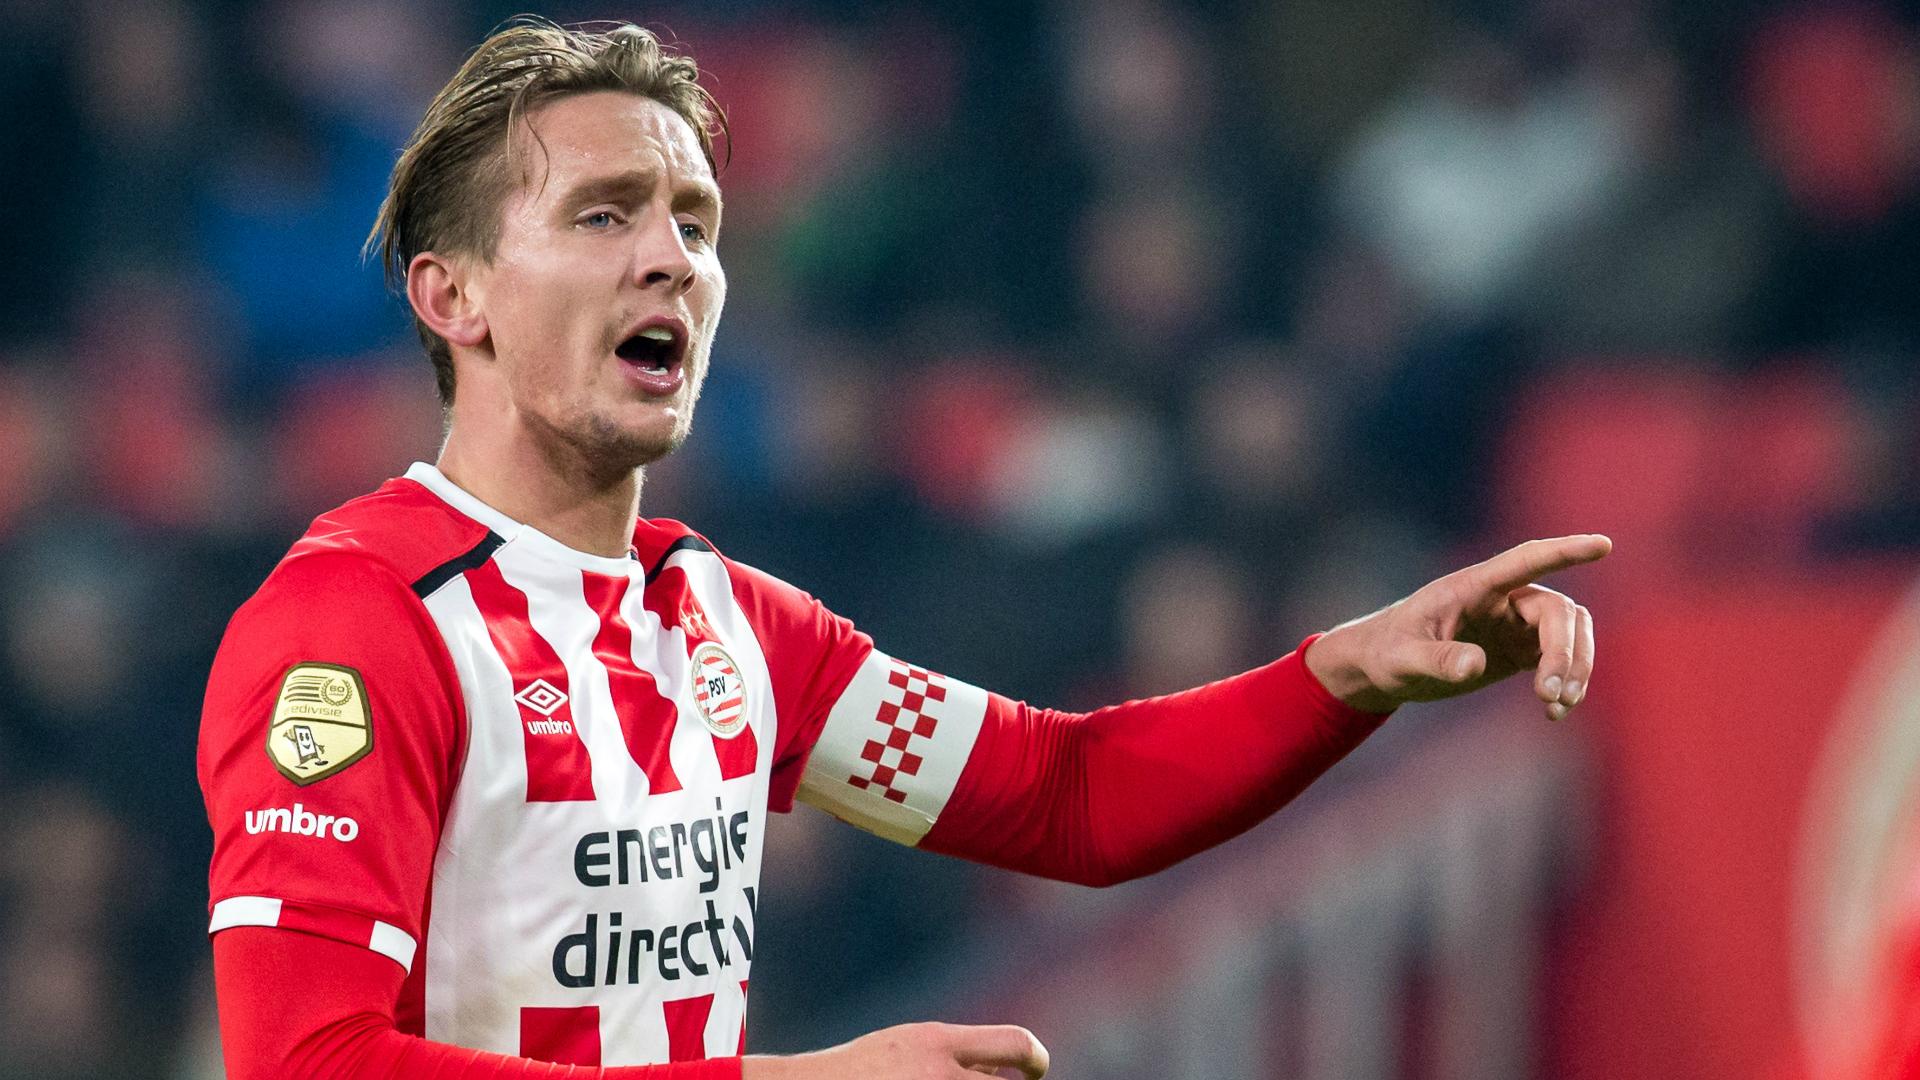 Luuk de Jong PSV Eredivisie 112602016